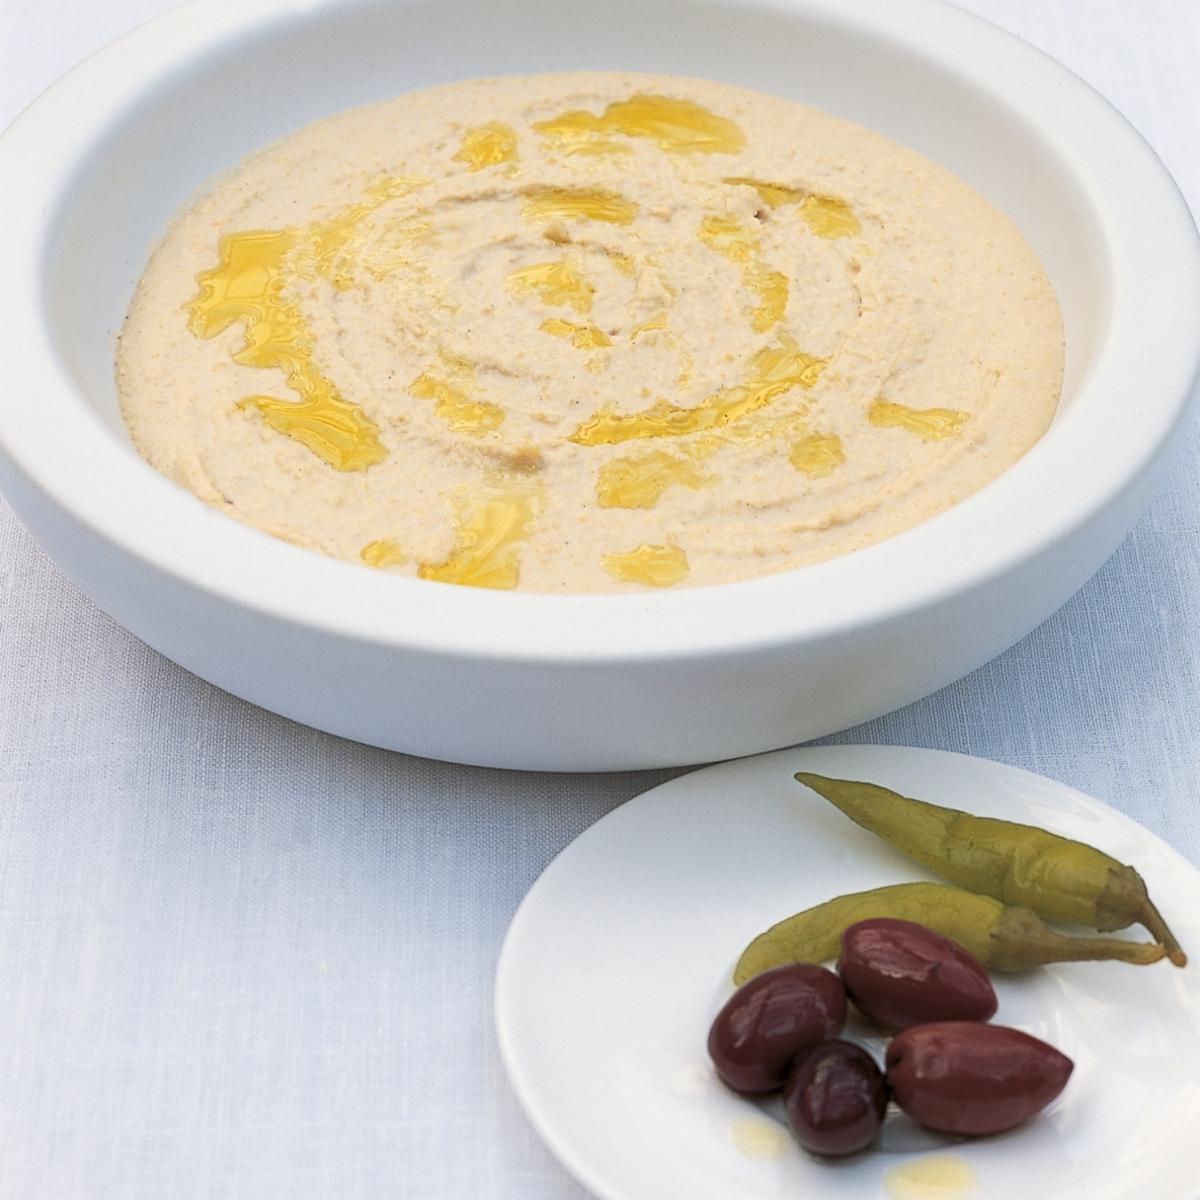 A picture of Delia's Hummus Bi Tahina recipe